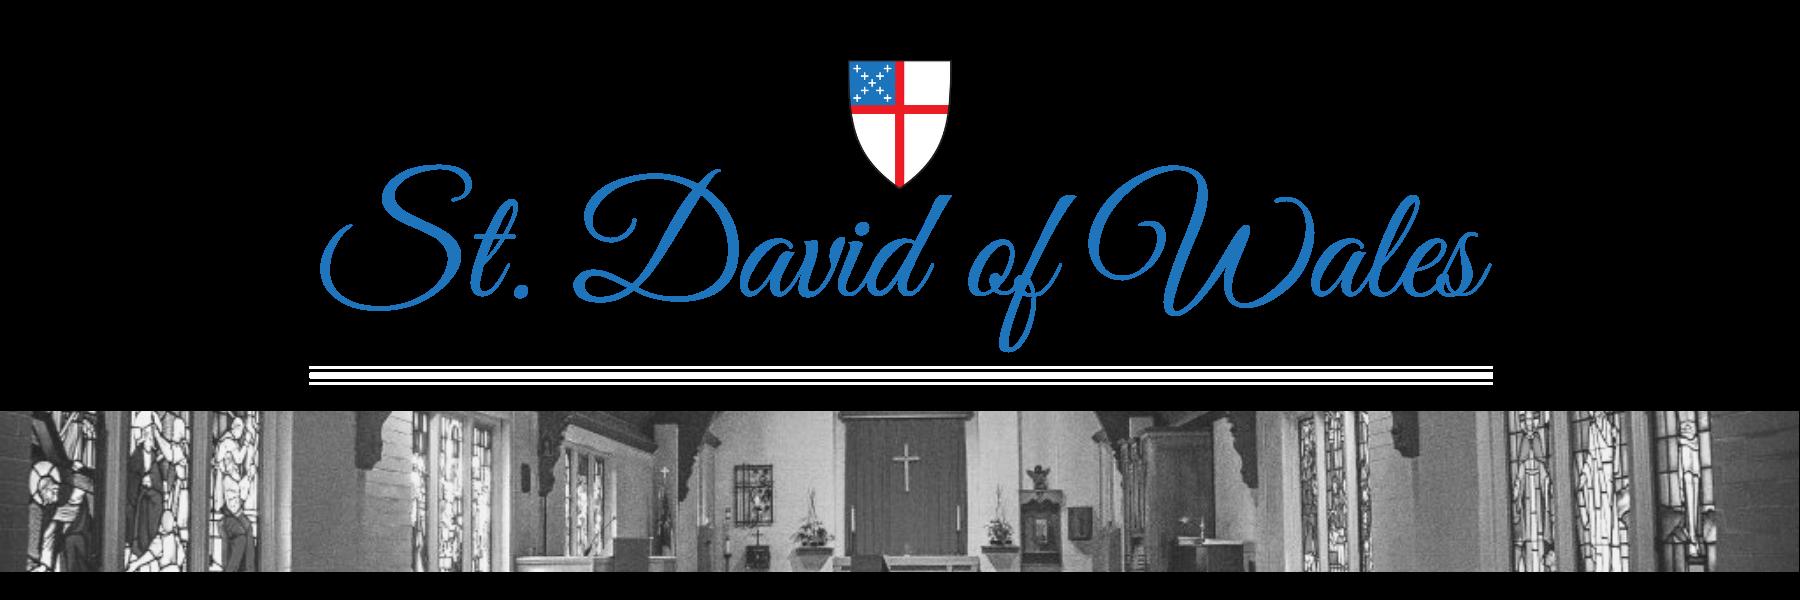 St David of Wales Church